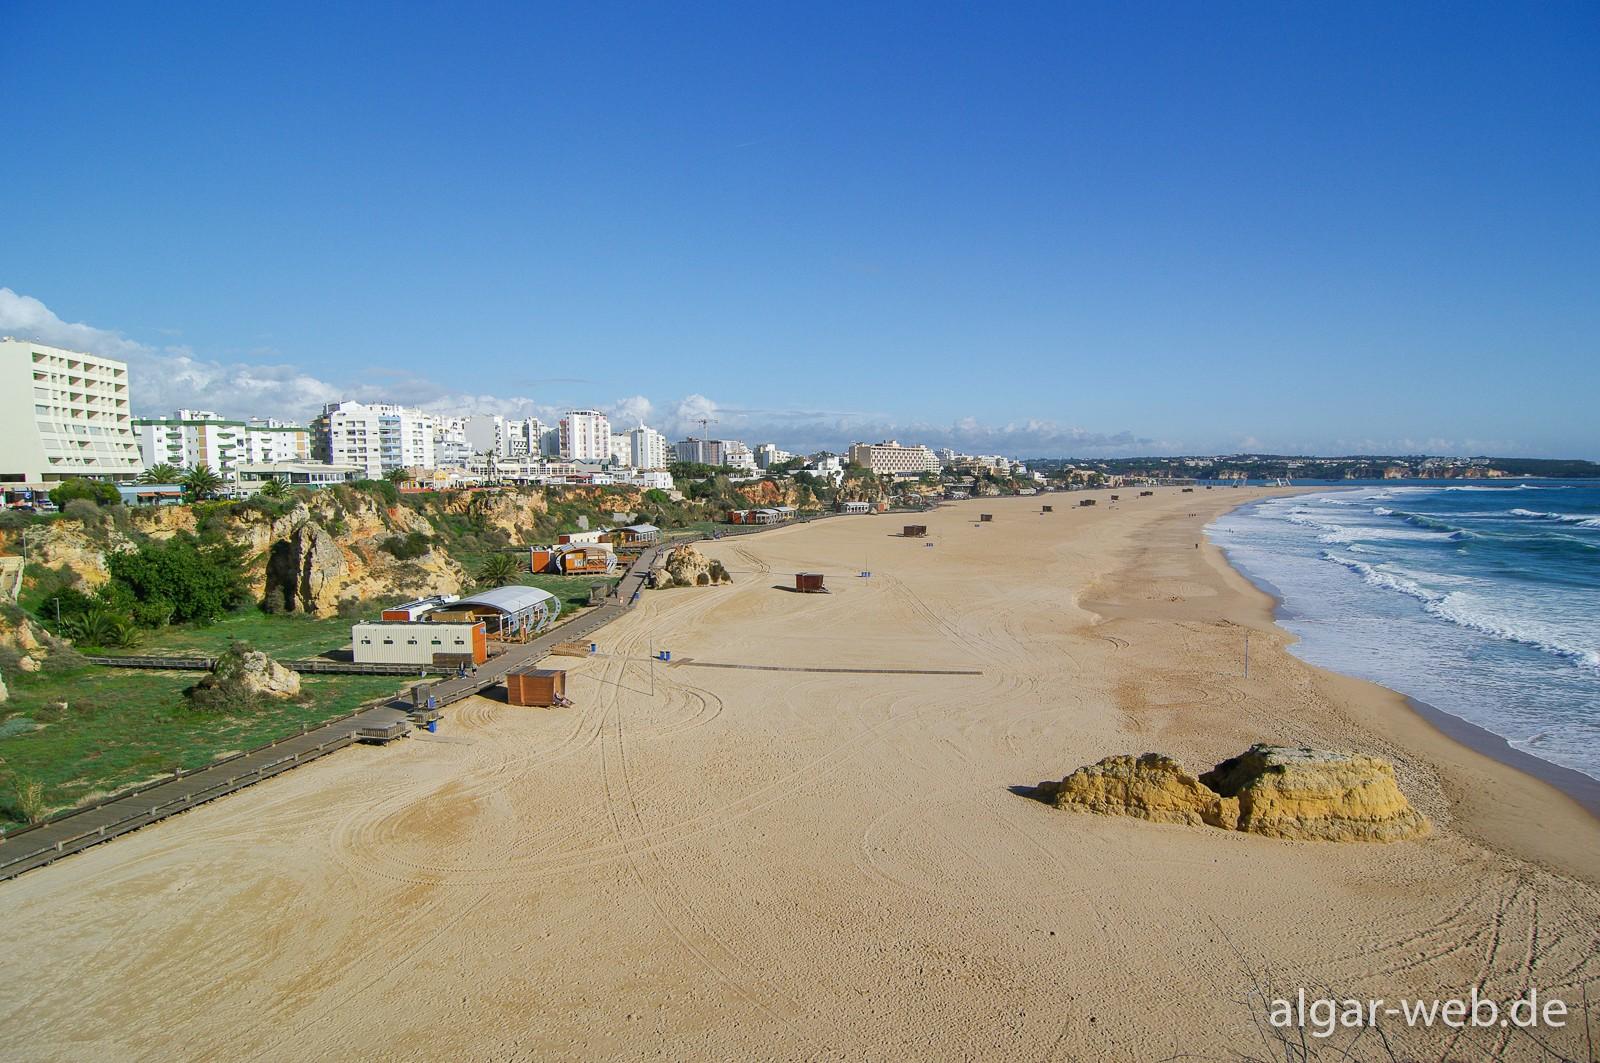 Praia da Rocha - Strand hui, Hinterland pfui